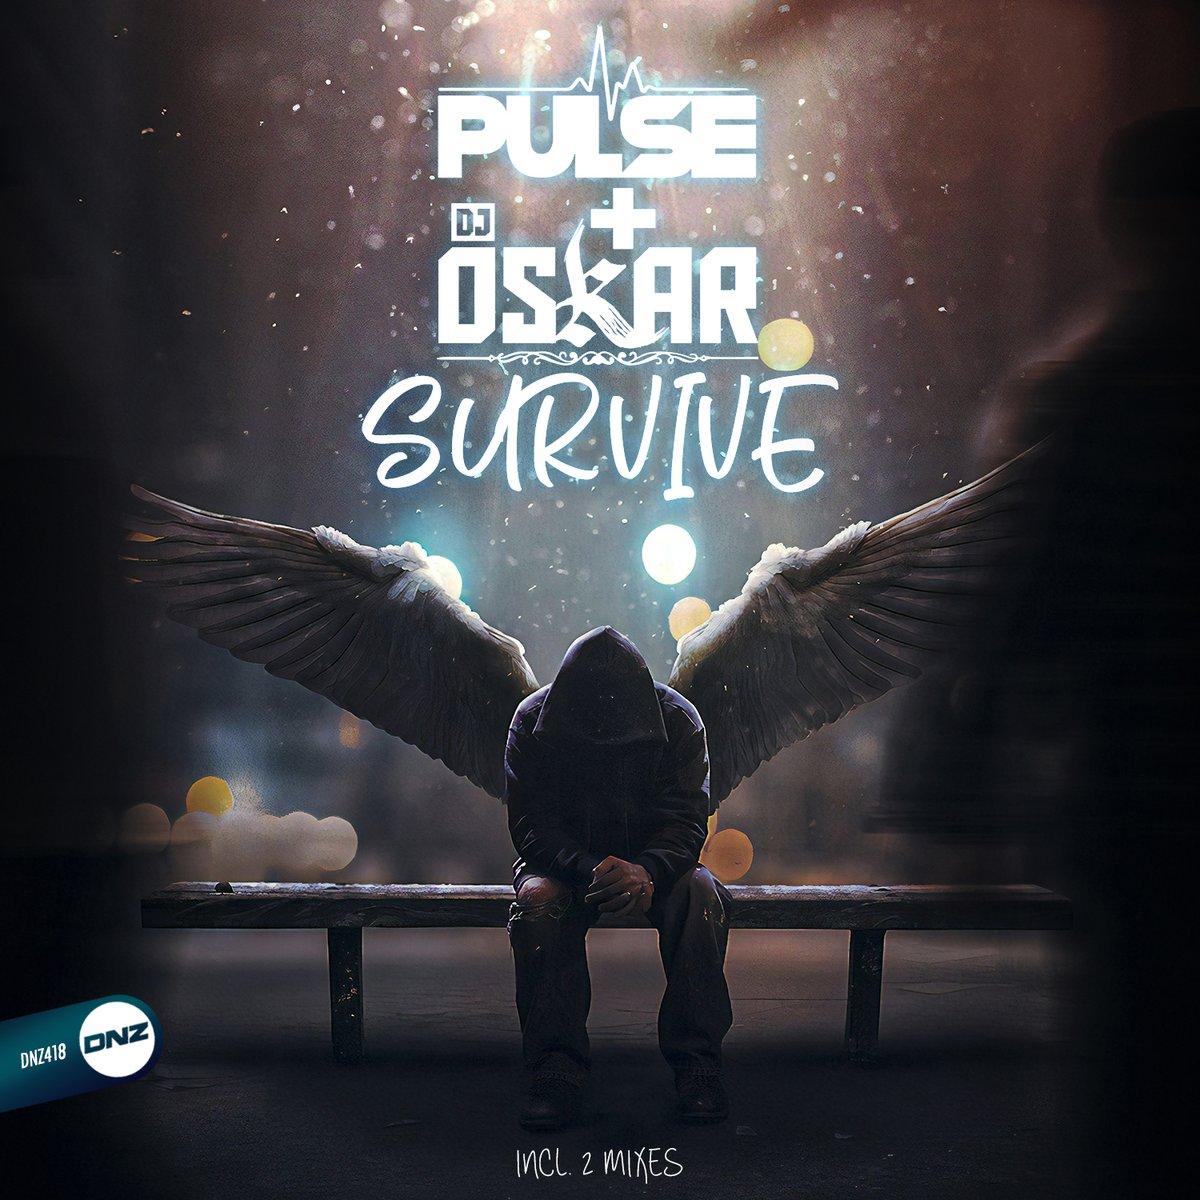 DJ PULSE & DJ OSKAR - SURVIVE / OUT NOW! / INCL. 2 MIXES https://t.co/ly9O6Qj4Zx https://t.co/ugfZHJ7rsT https://t.co/C3YUnG9pcO https://t.co/49sm83OSTo https://t.co/LOQP7YaafS #bounce #hdm #dnzrecords #tune https://t.co/5PqvRsAGdh